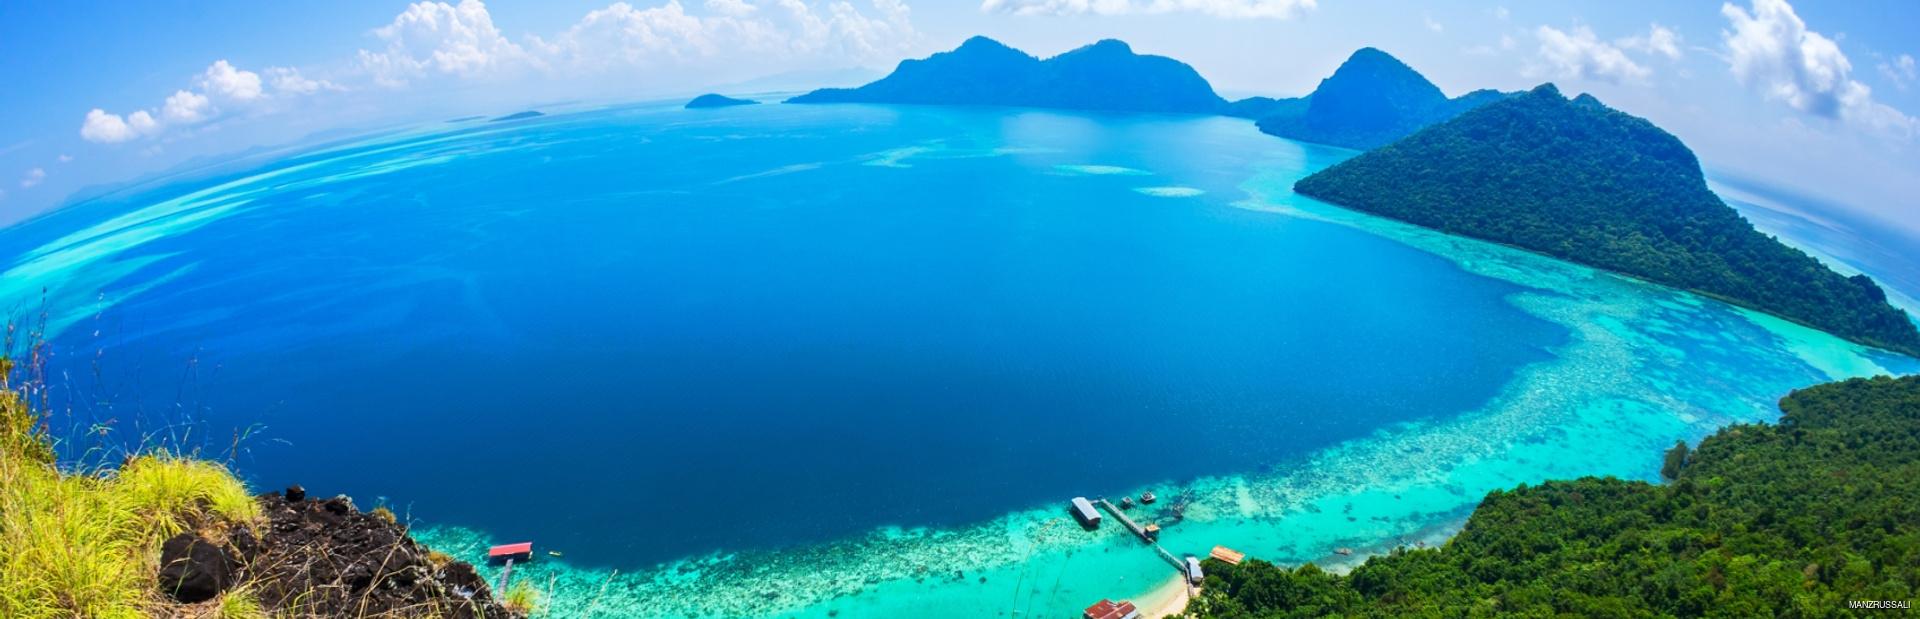 Green Malaysian coastline with hills and beautiful blue sea